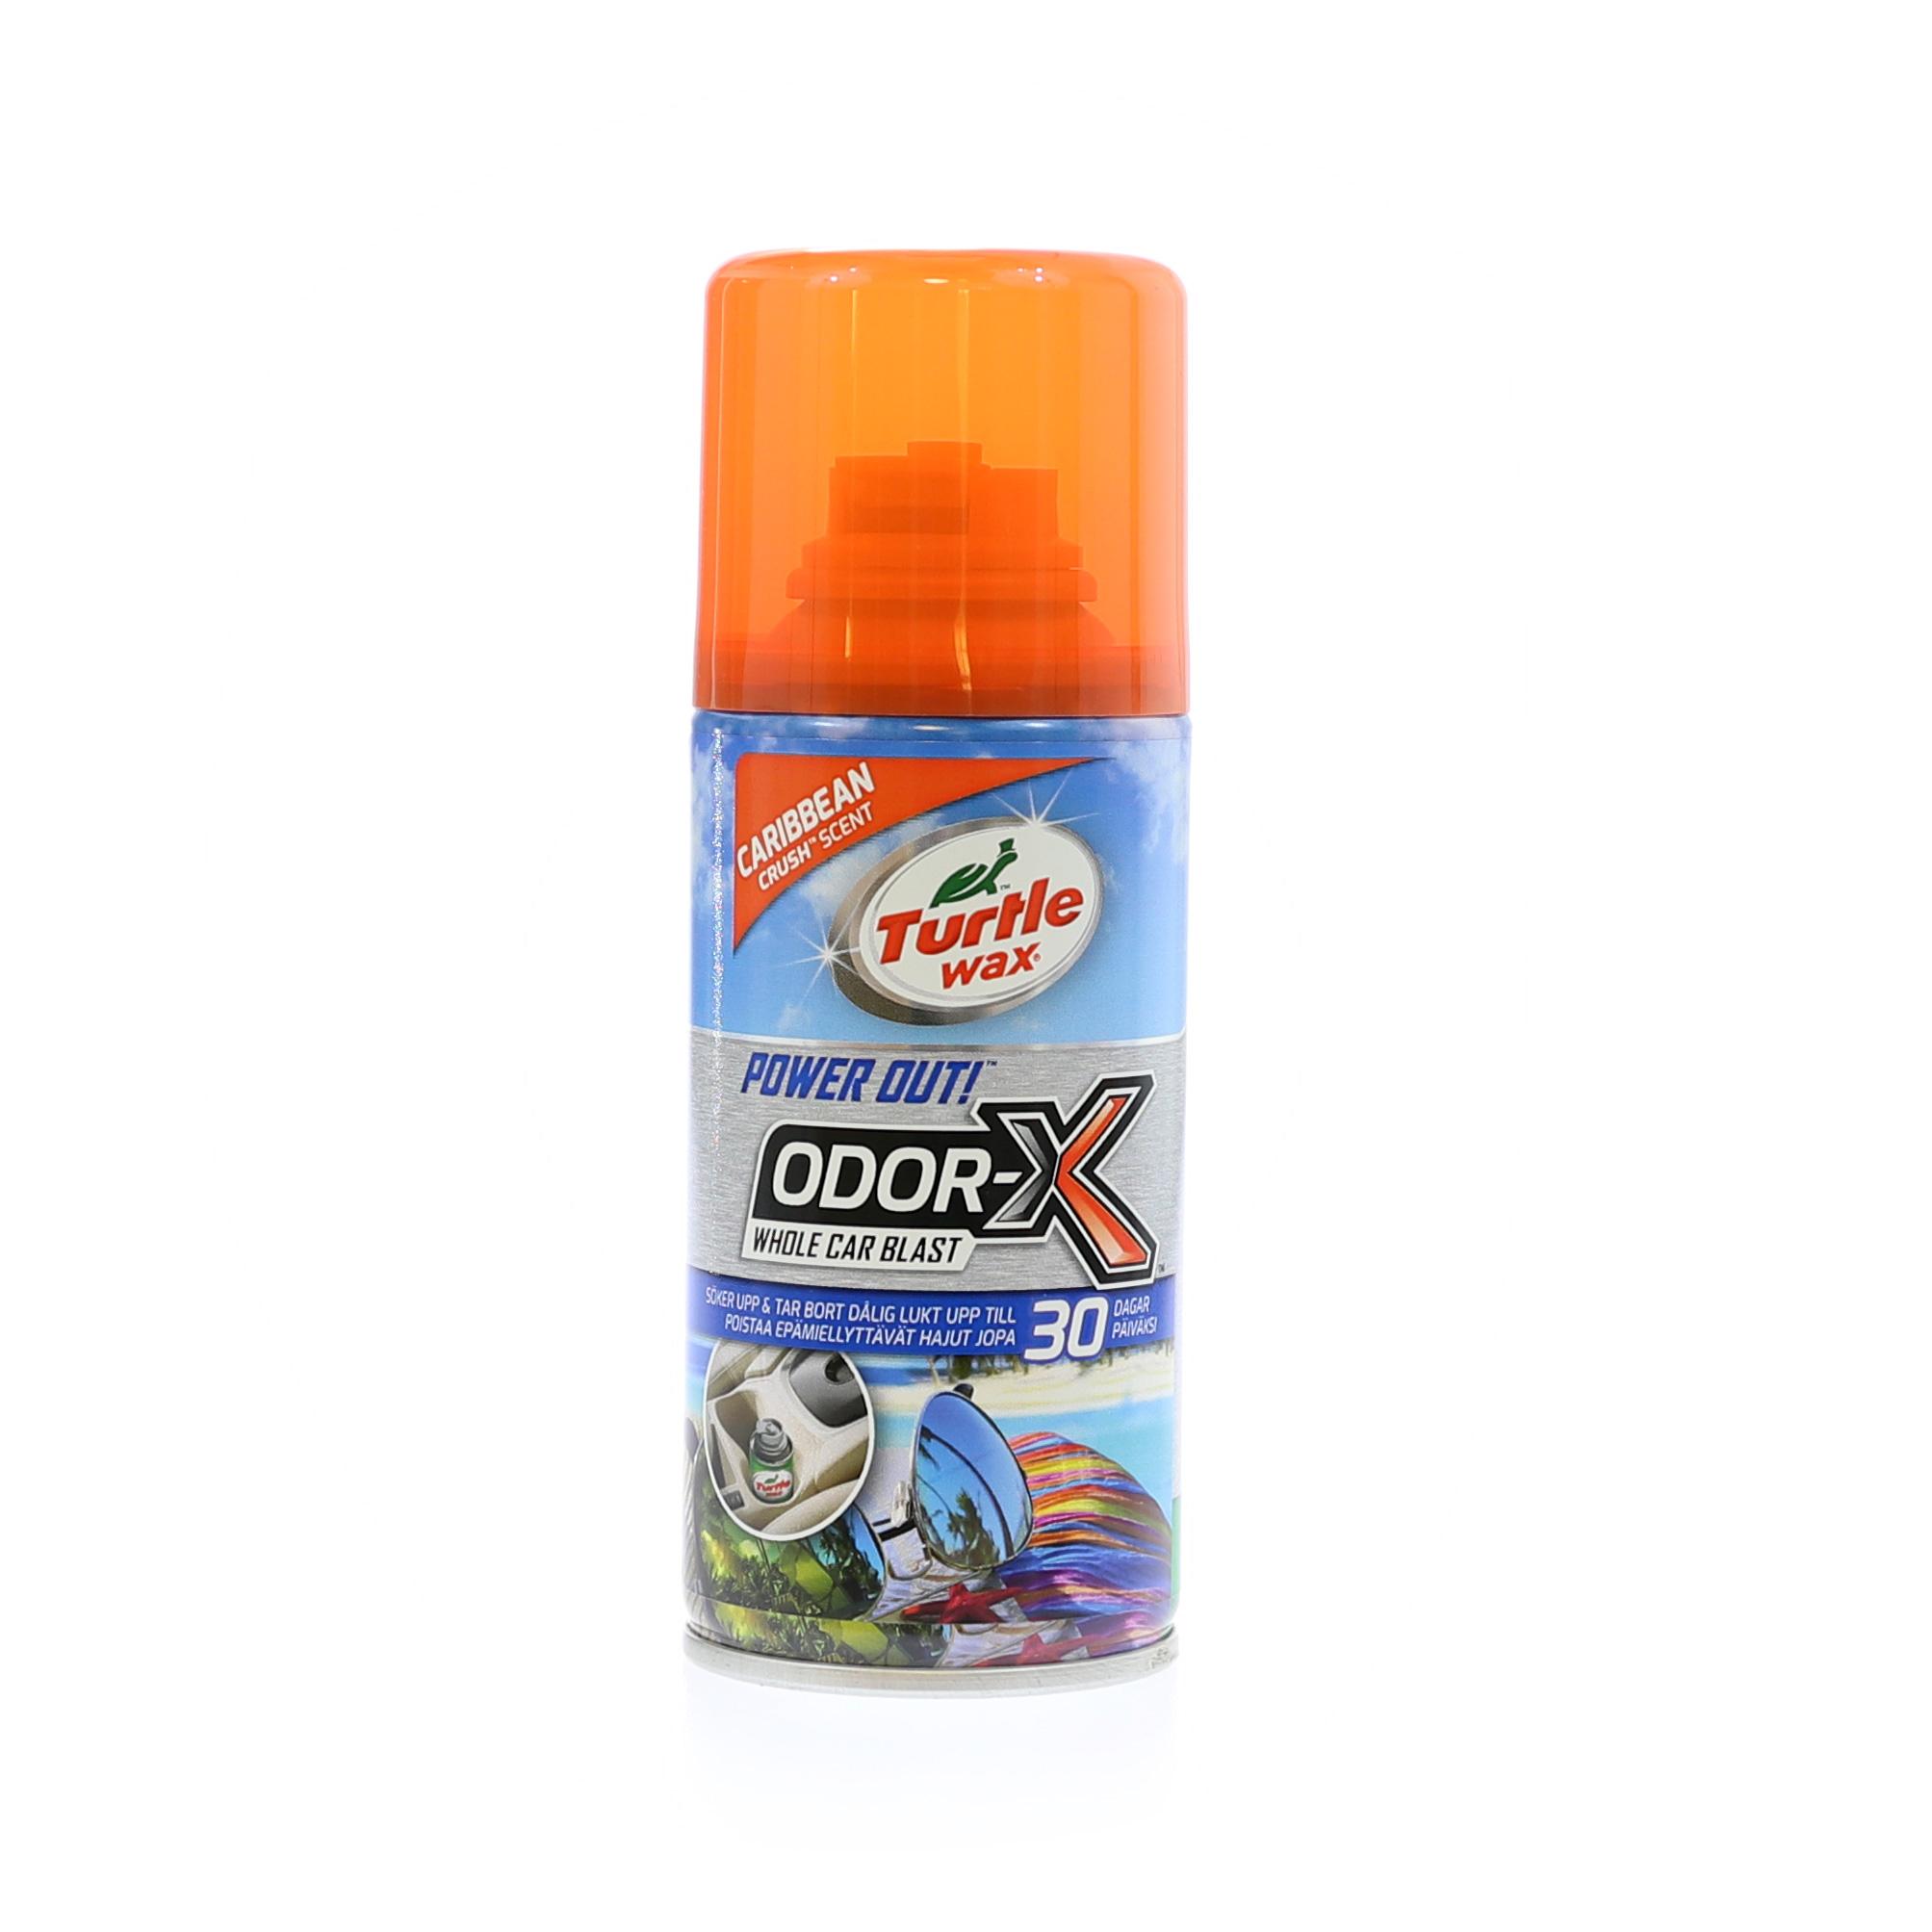 Luktborttagare Turtle Wax Odor-X Whole Car Blast, 100 ml, Caribbean Crush